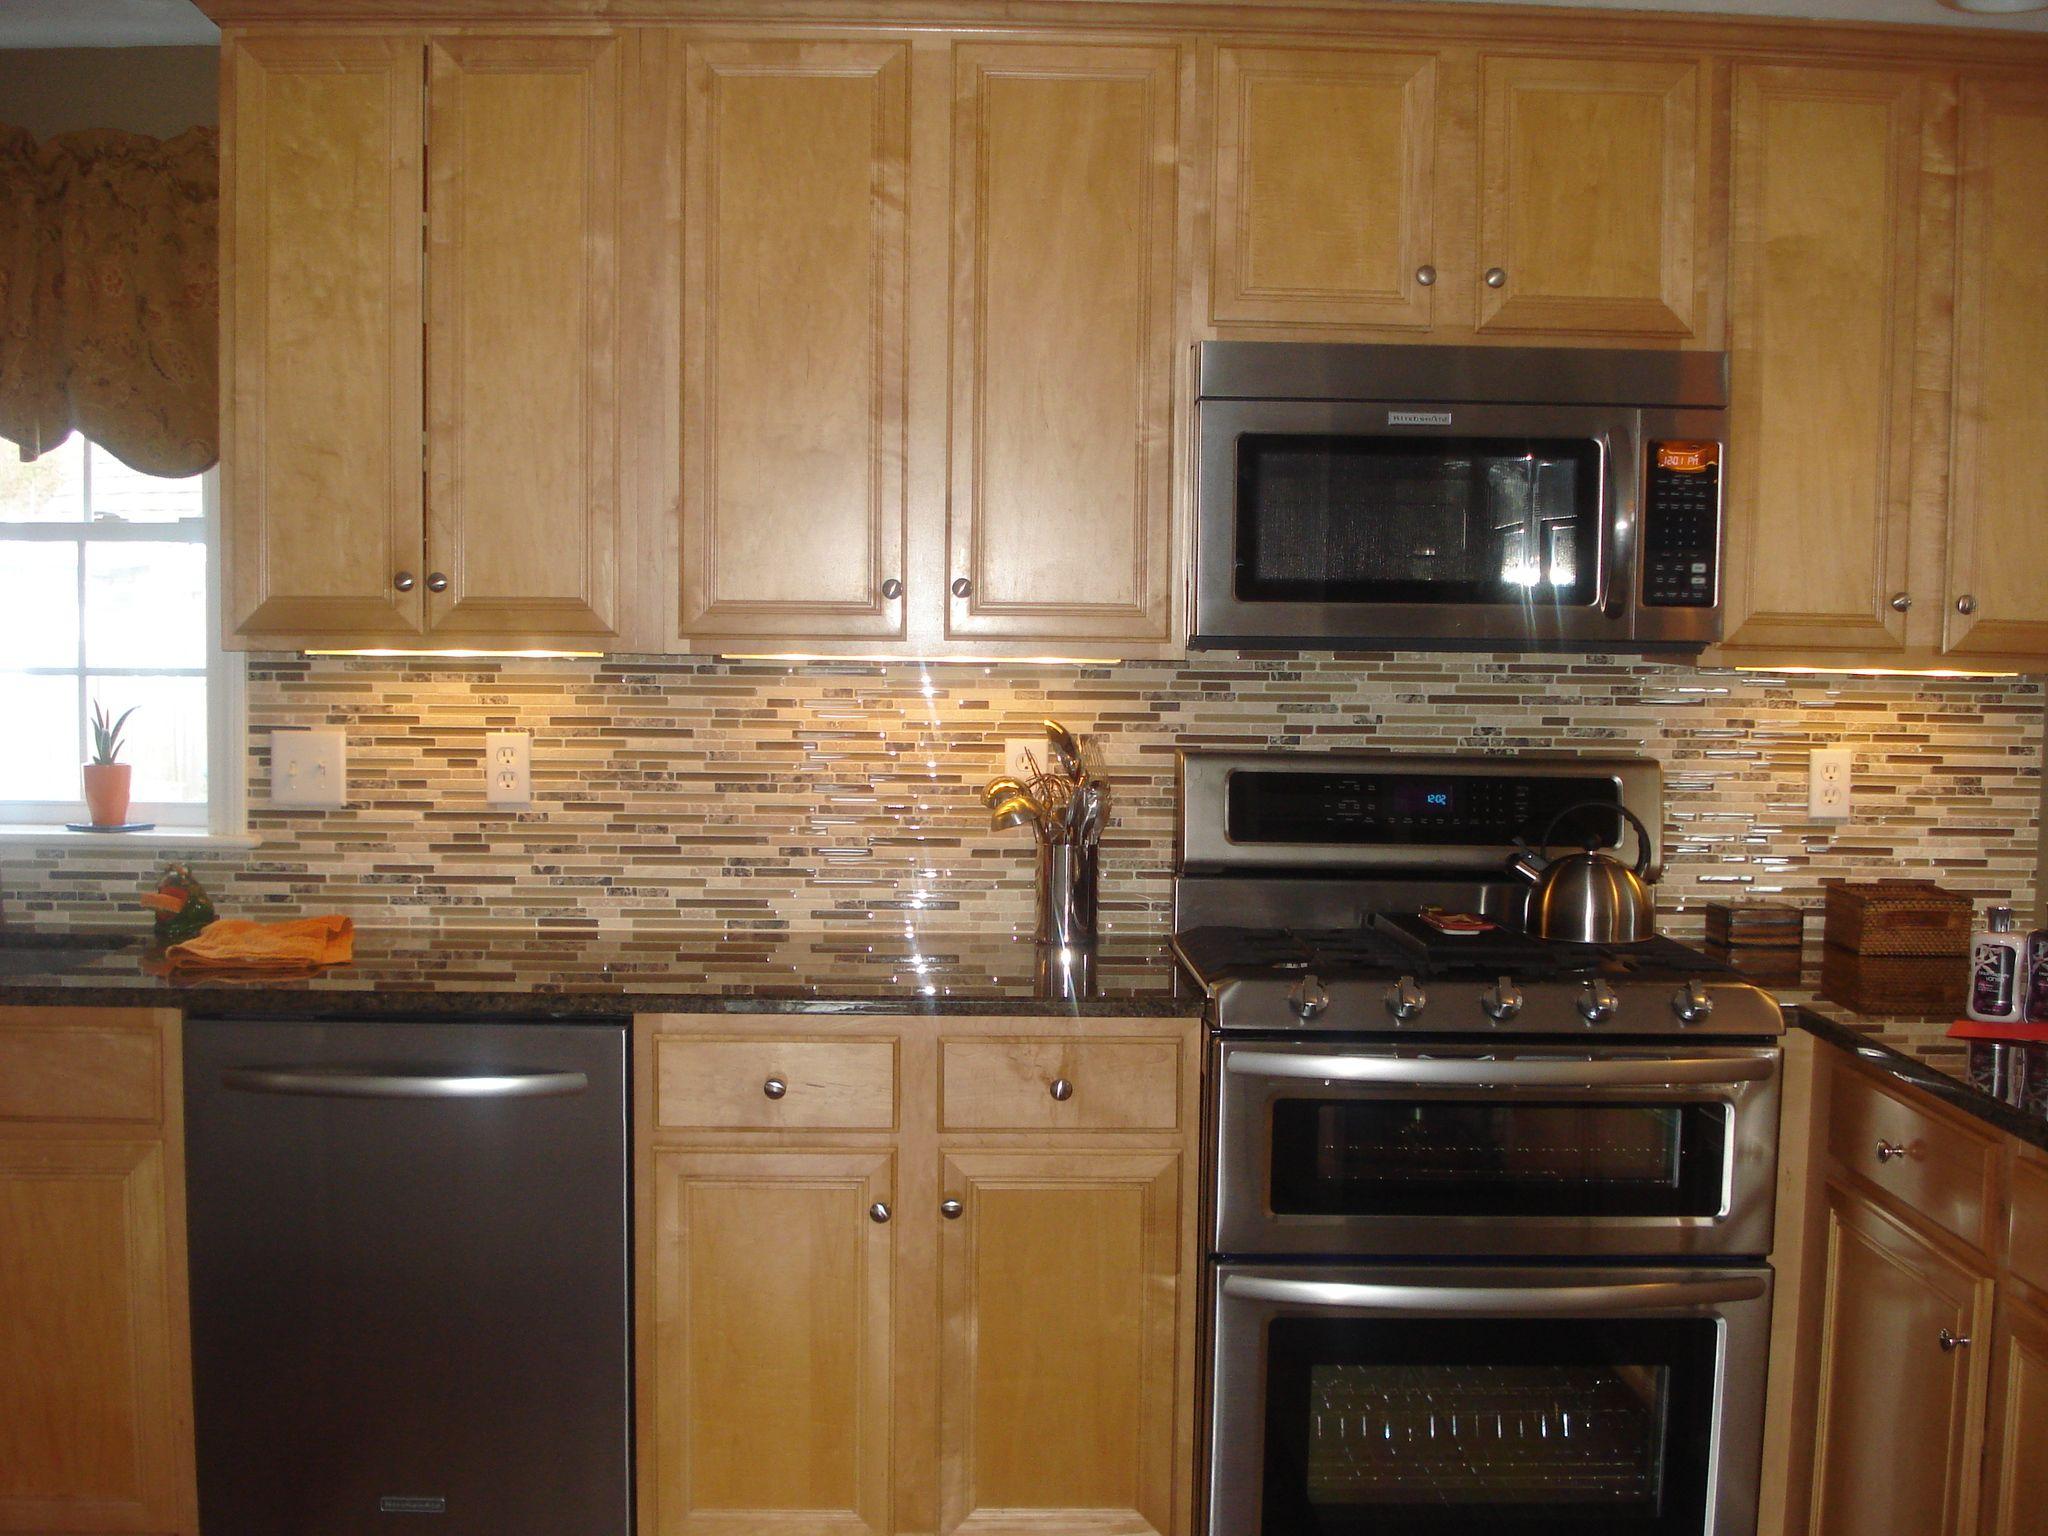 kitchen counter ideas oak cabinets kitchen counters and backsplash Backsplash Gl Tile Brown With Cabinets